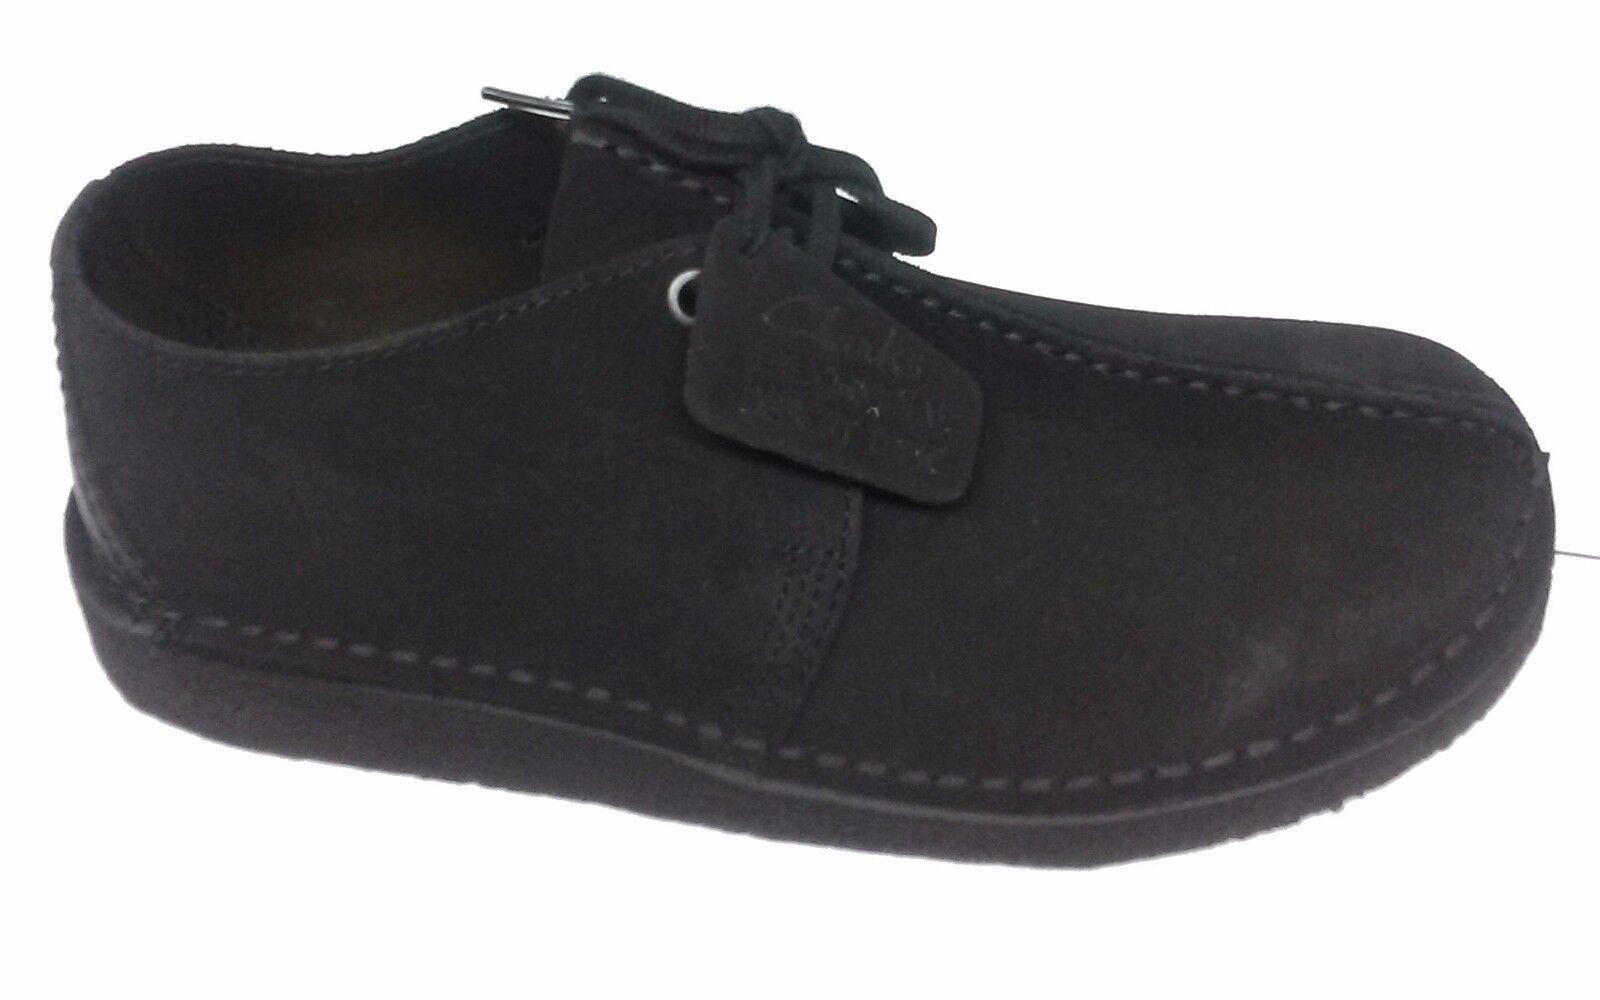 MEN'S Clarks Original DESERT TREK casual shoes  ALL BLACK SUEDE 13258